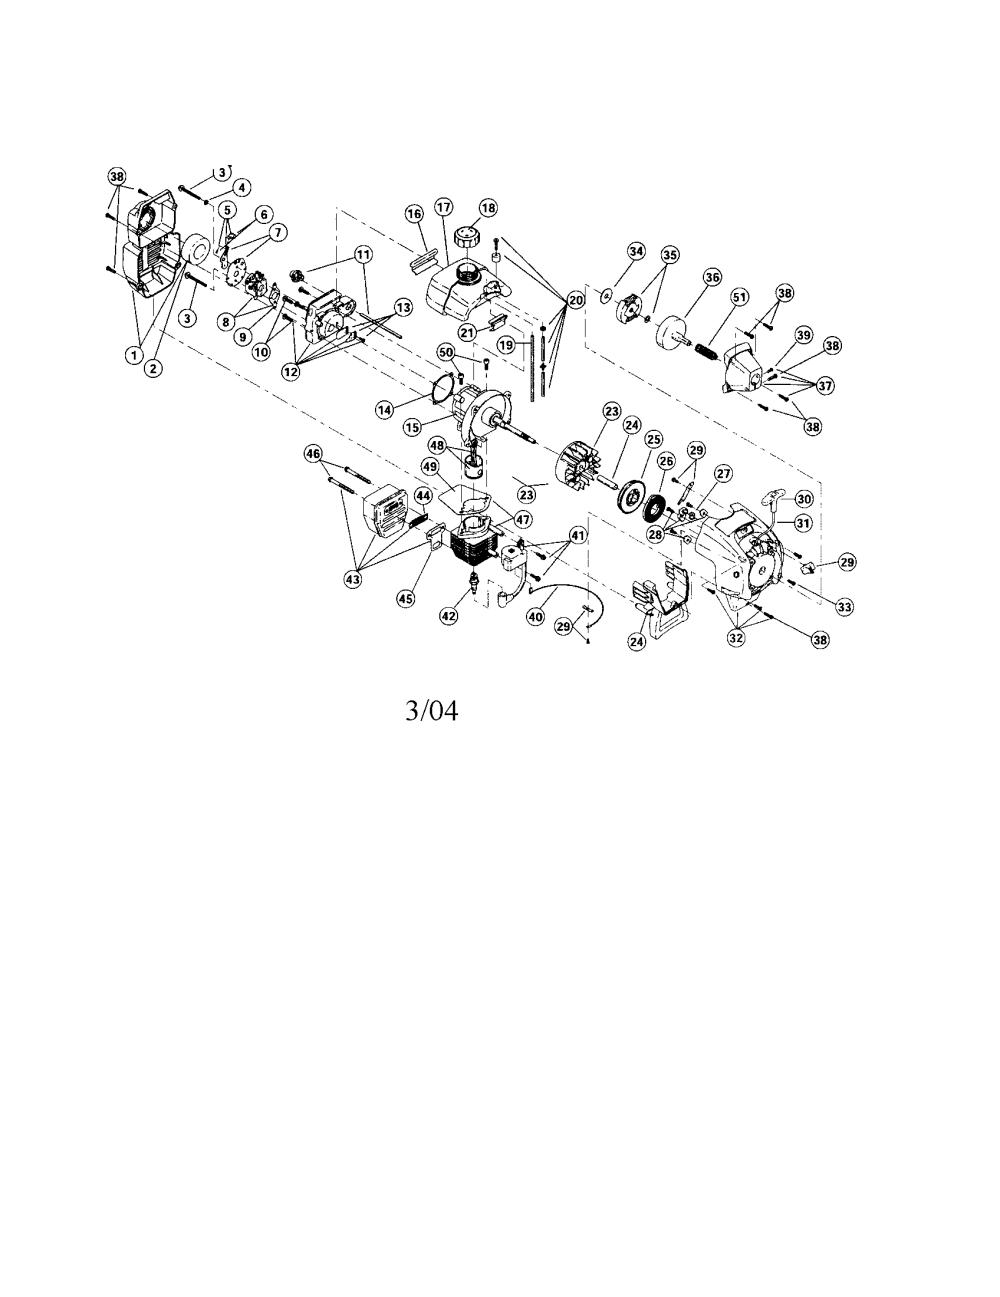 medium resolution of ryobi model 725r line trimmers weedwackers gas genuine parts